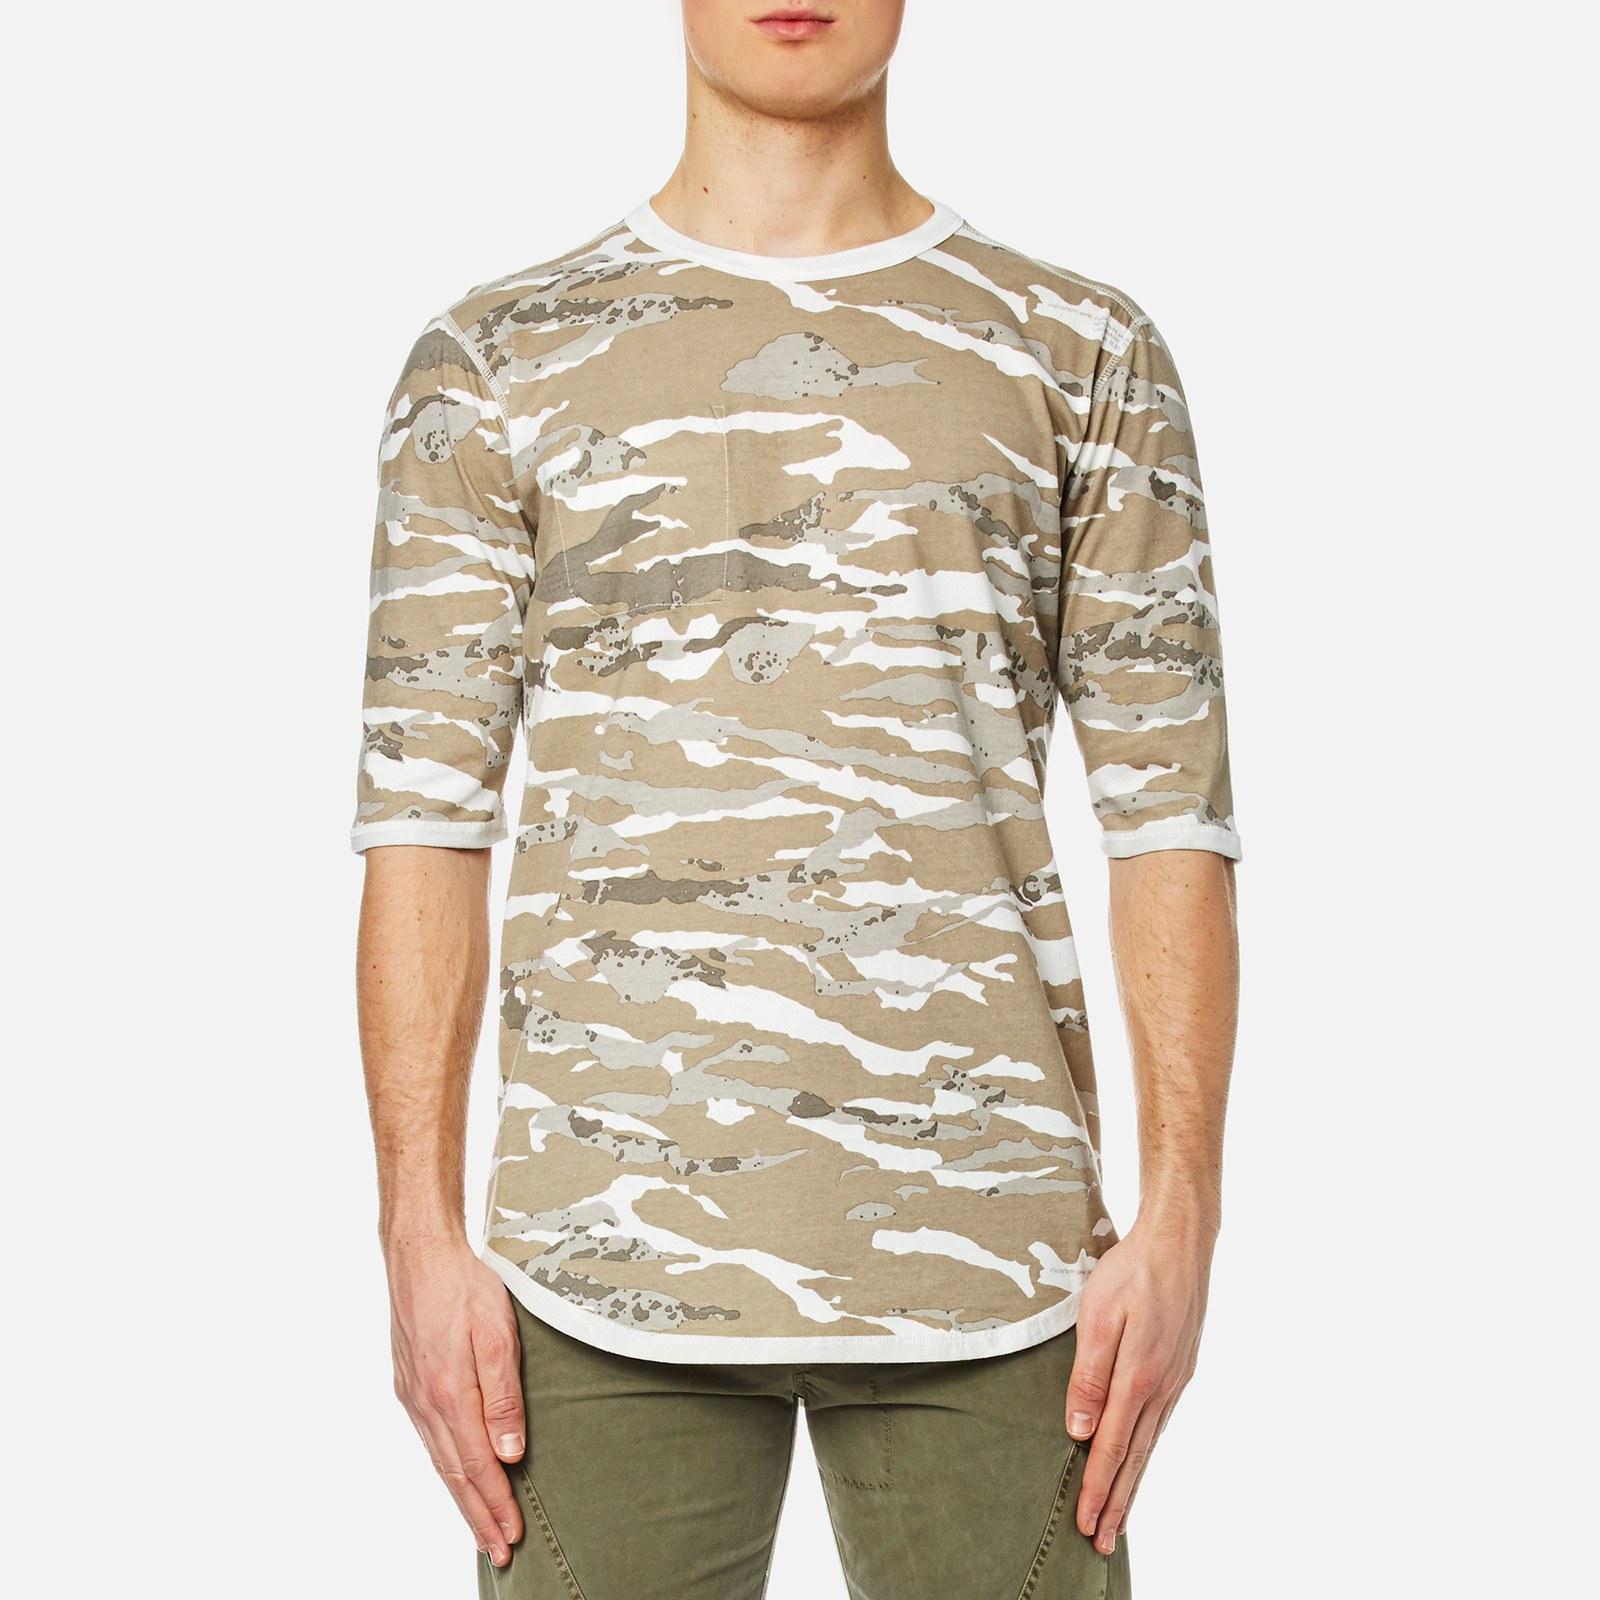 d044a42e11 Maharishi Men's Reversible Camo T-Shirt - Naturale - Free UK Delivery over  £50